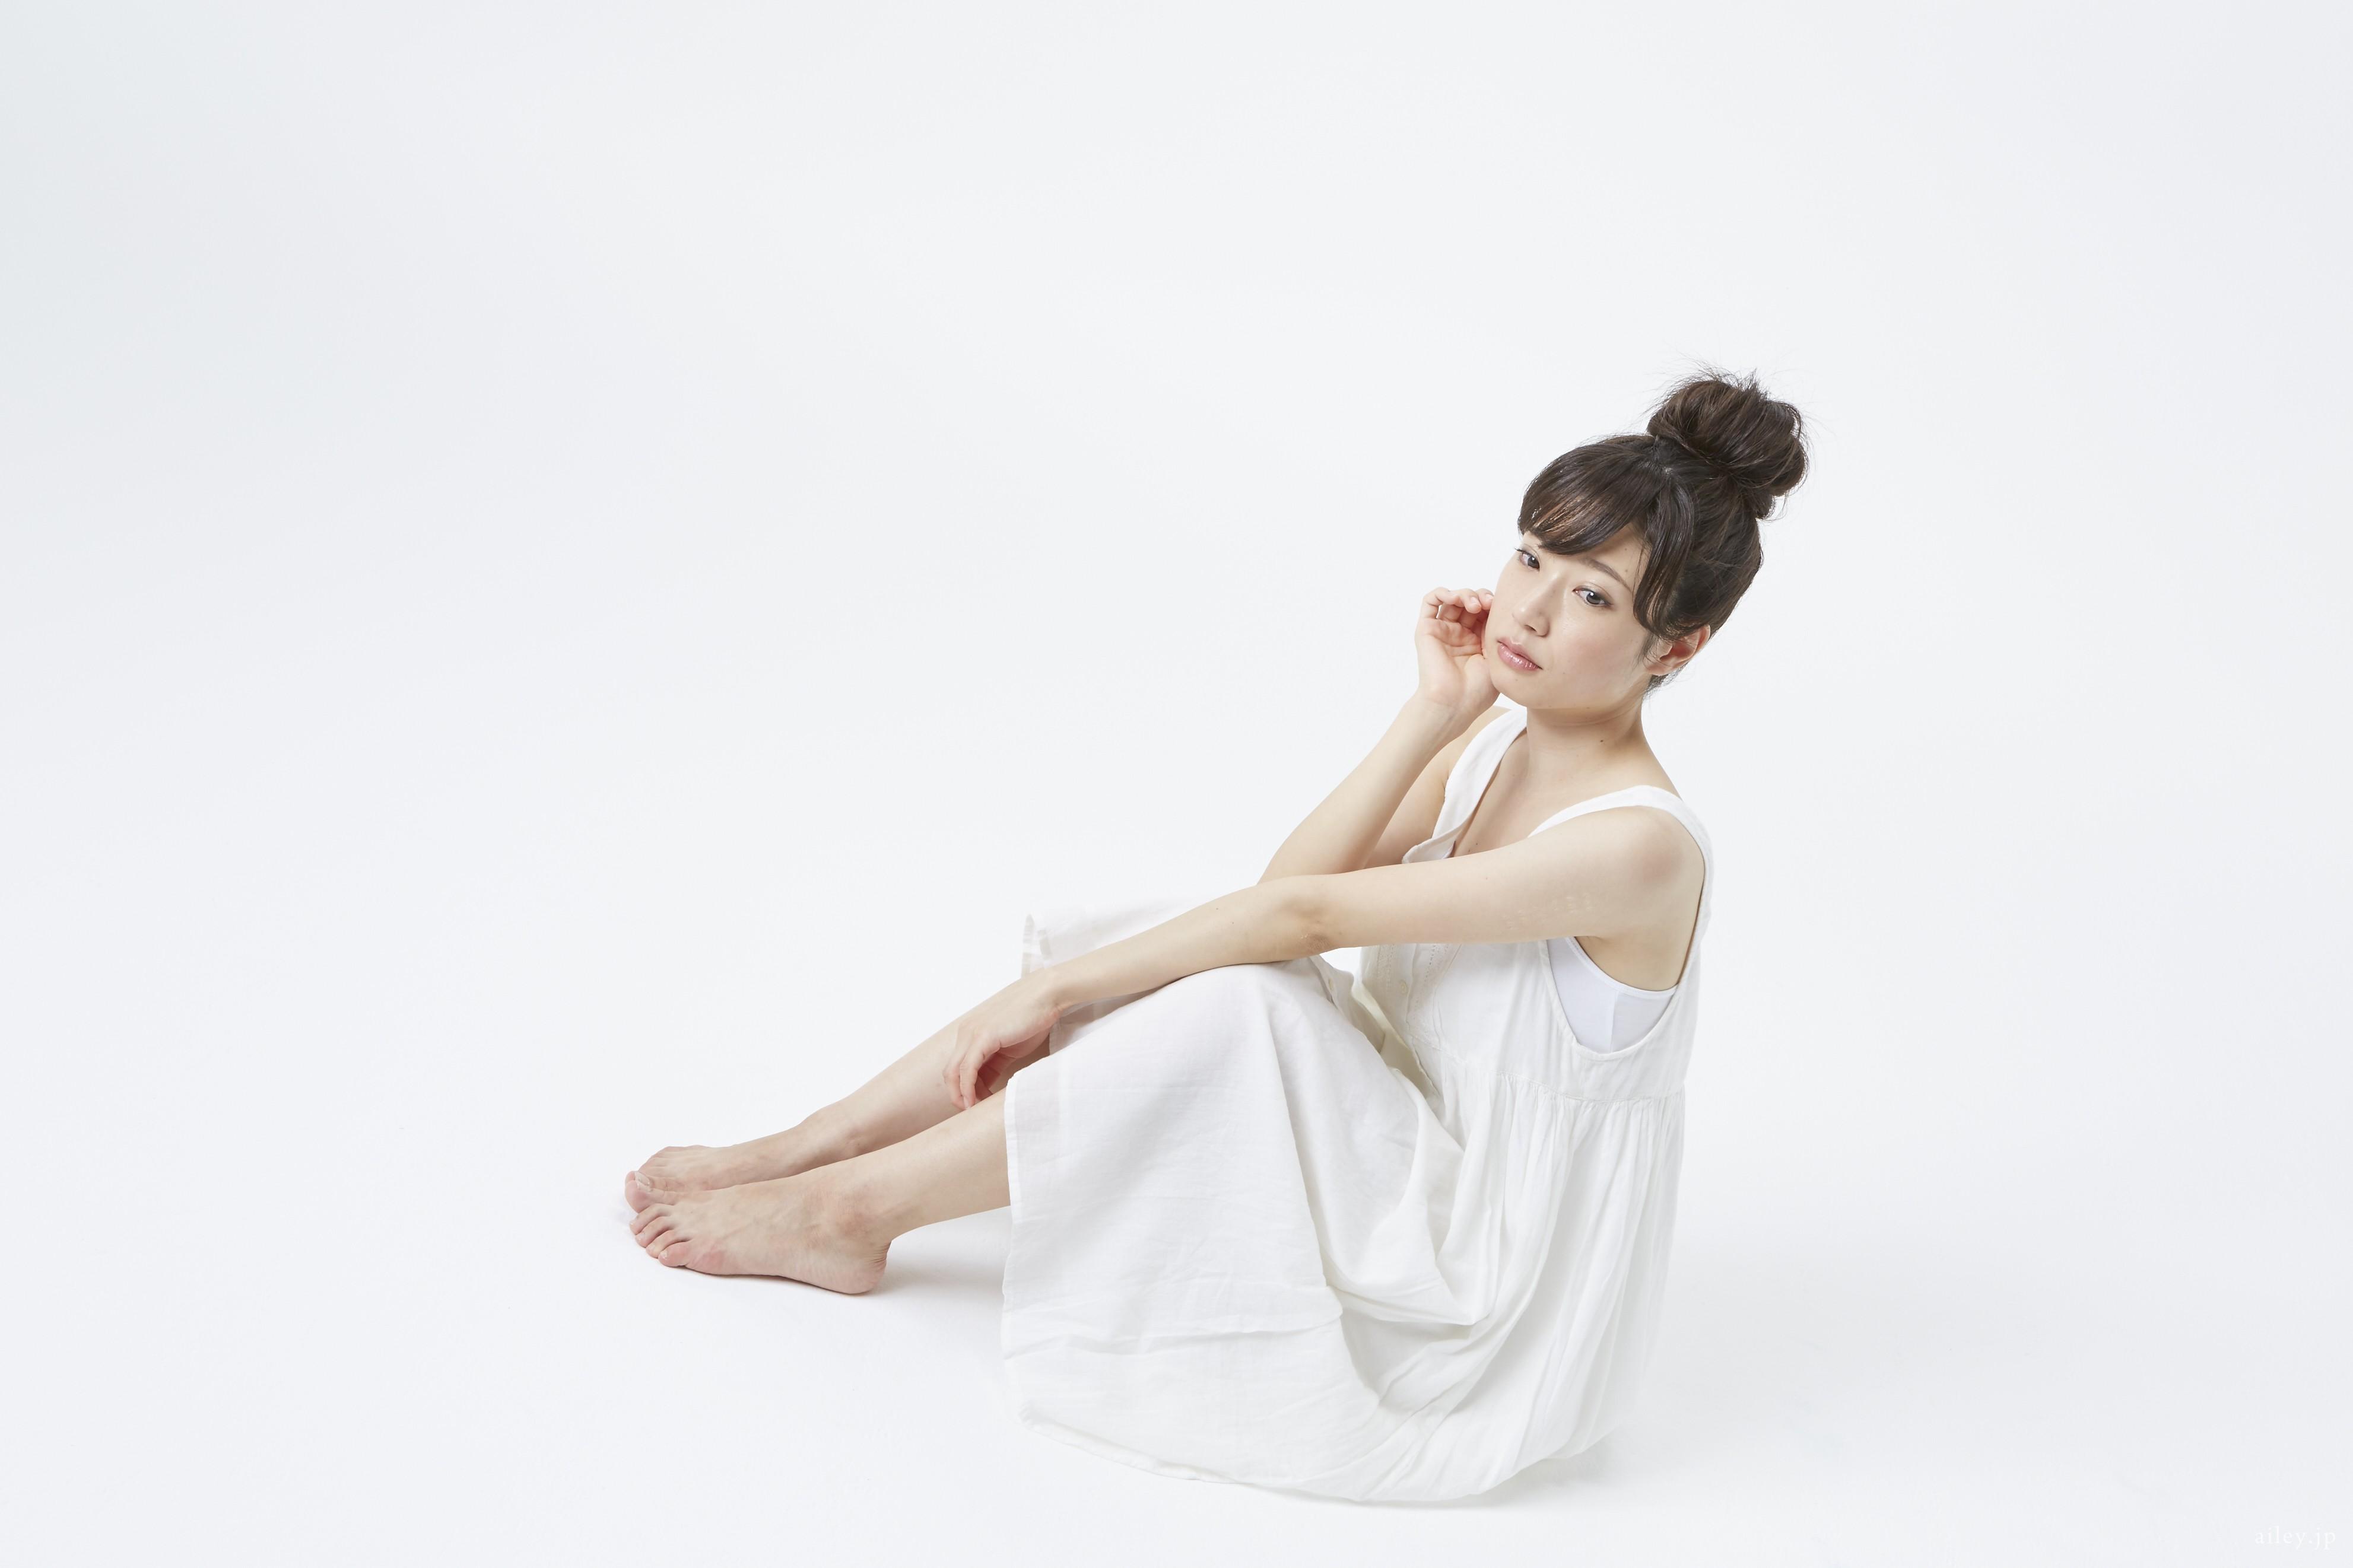 pose_71_mika